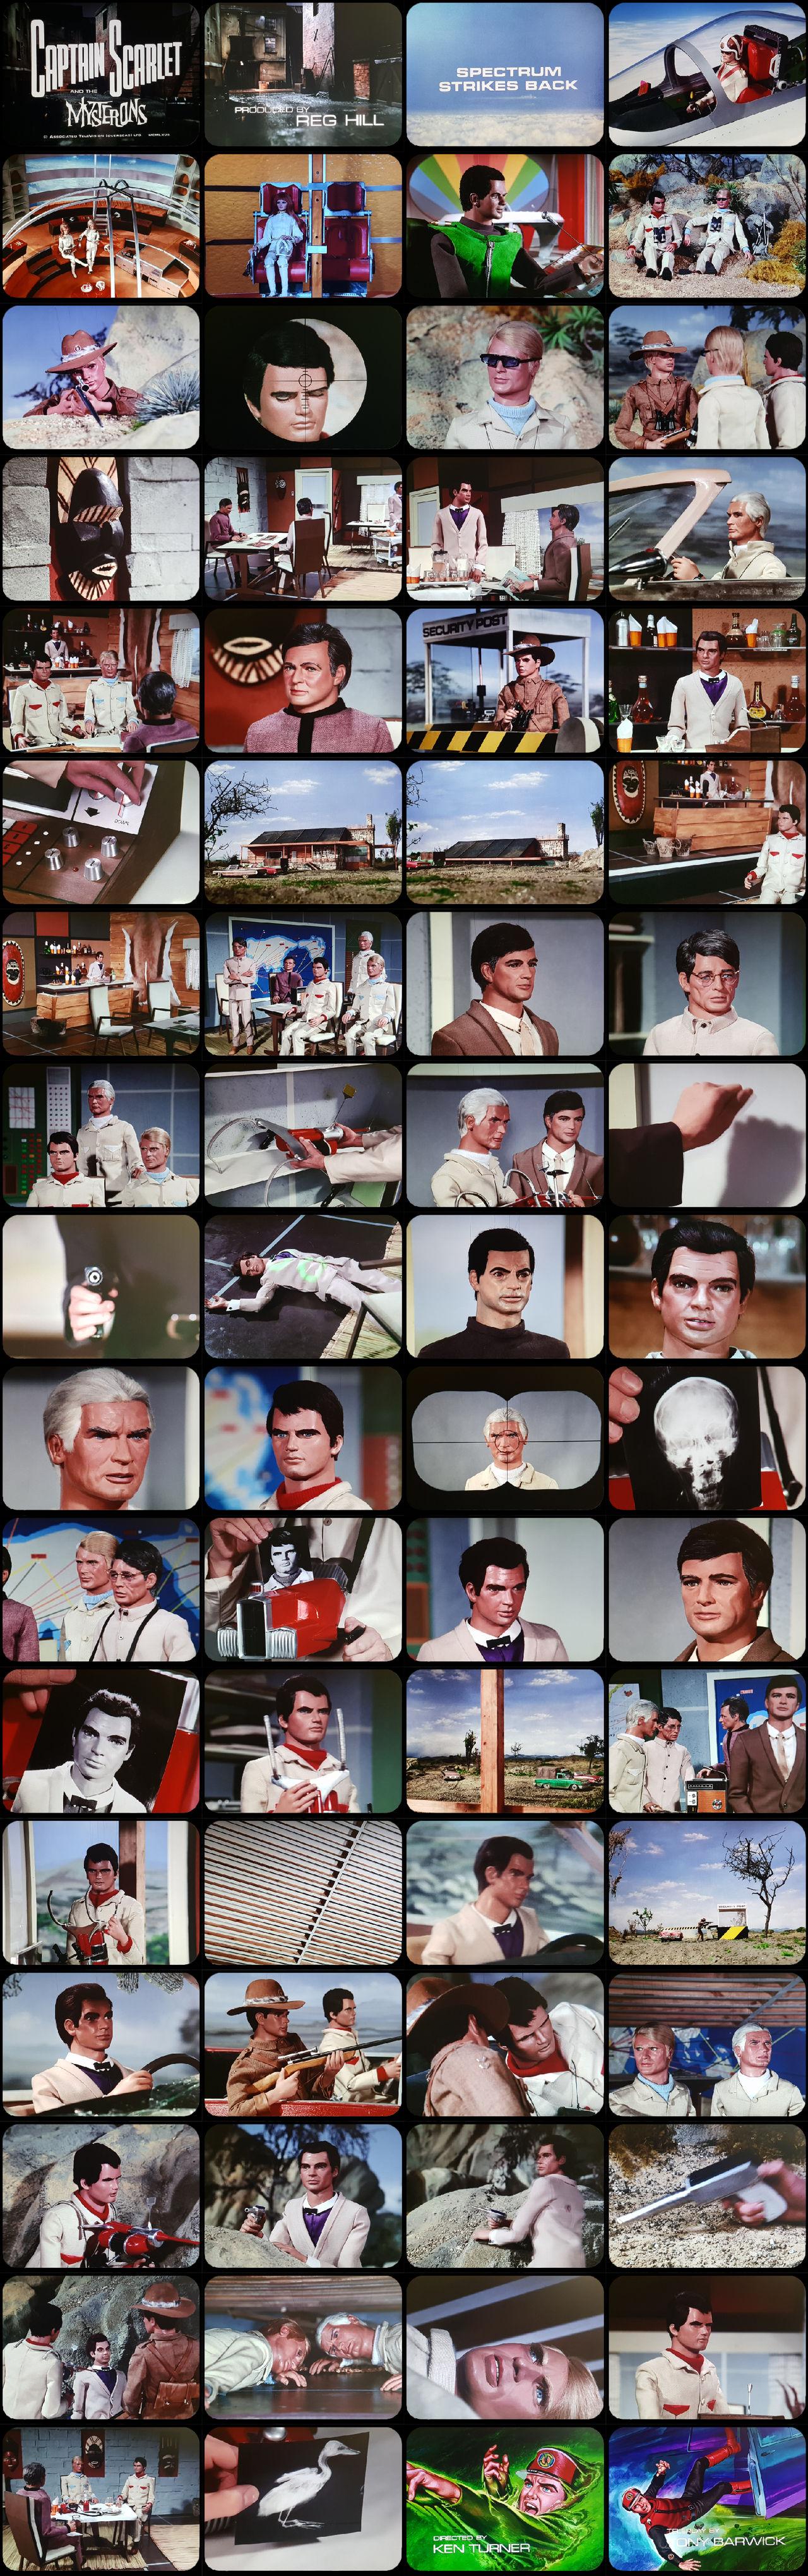 Captain Scarlet Episode 10 Tele-Snaps (REDONE)